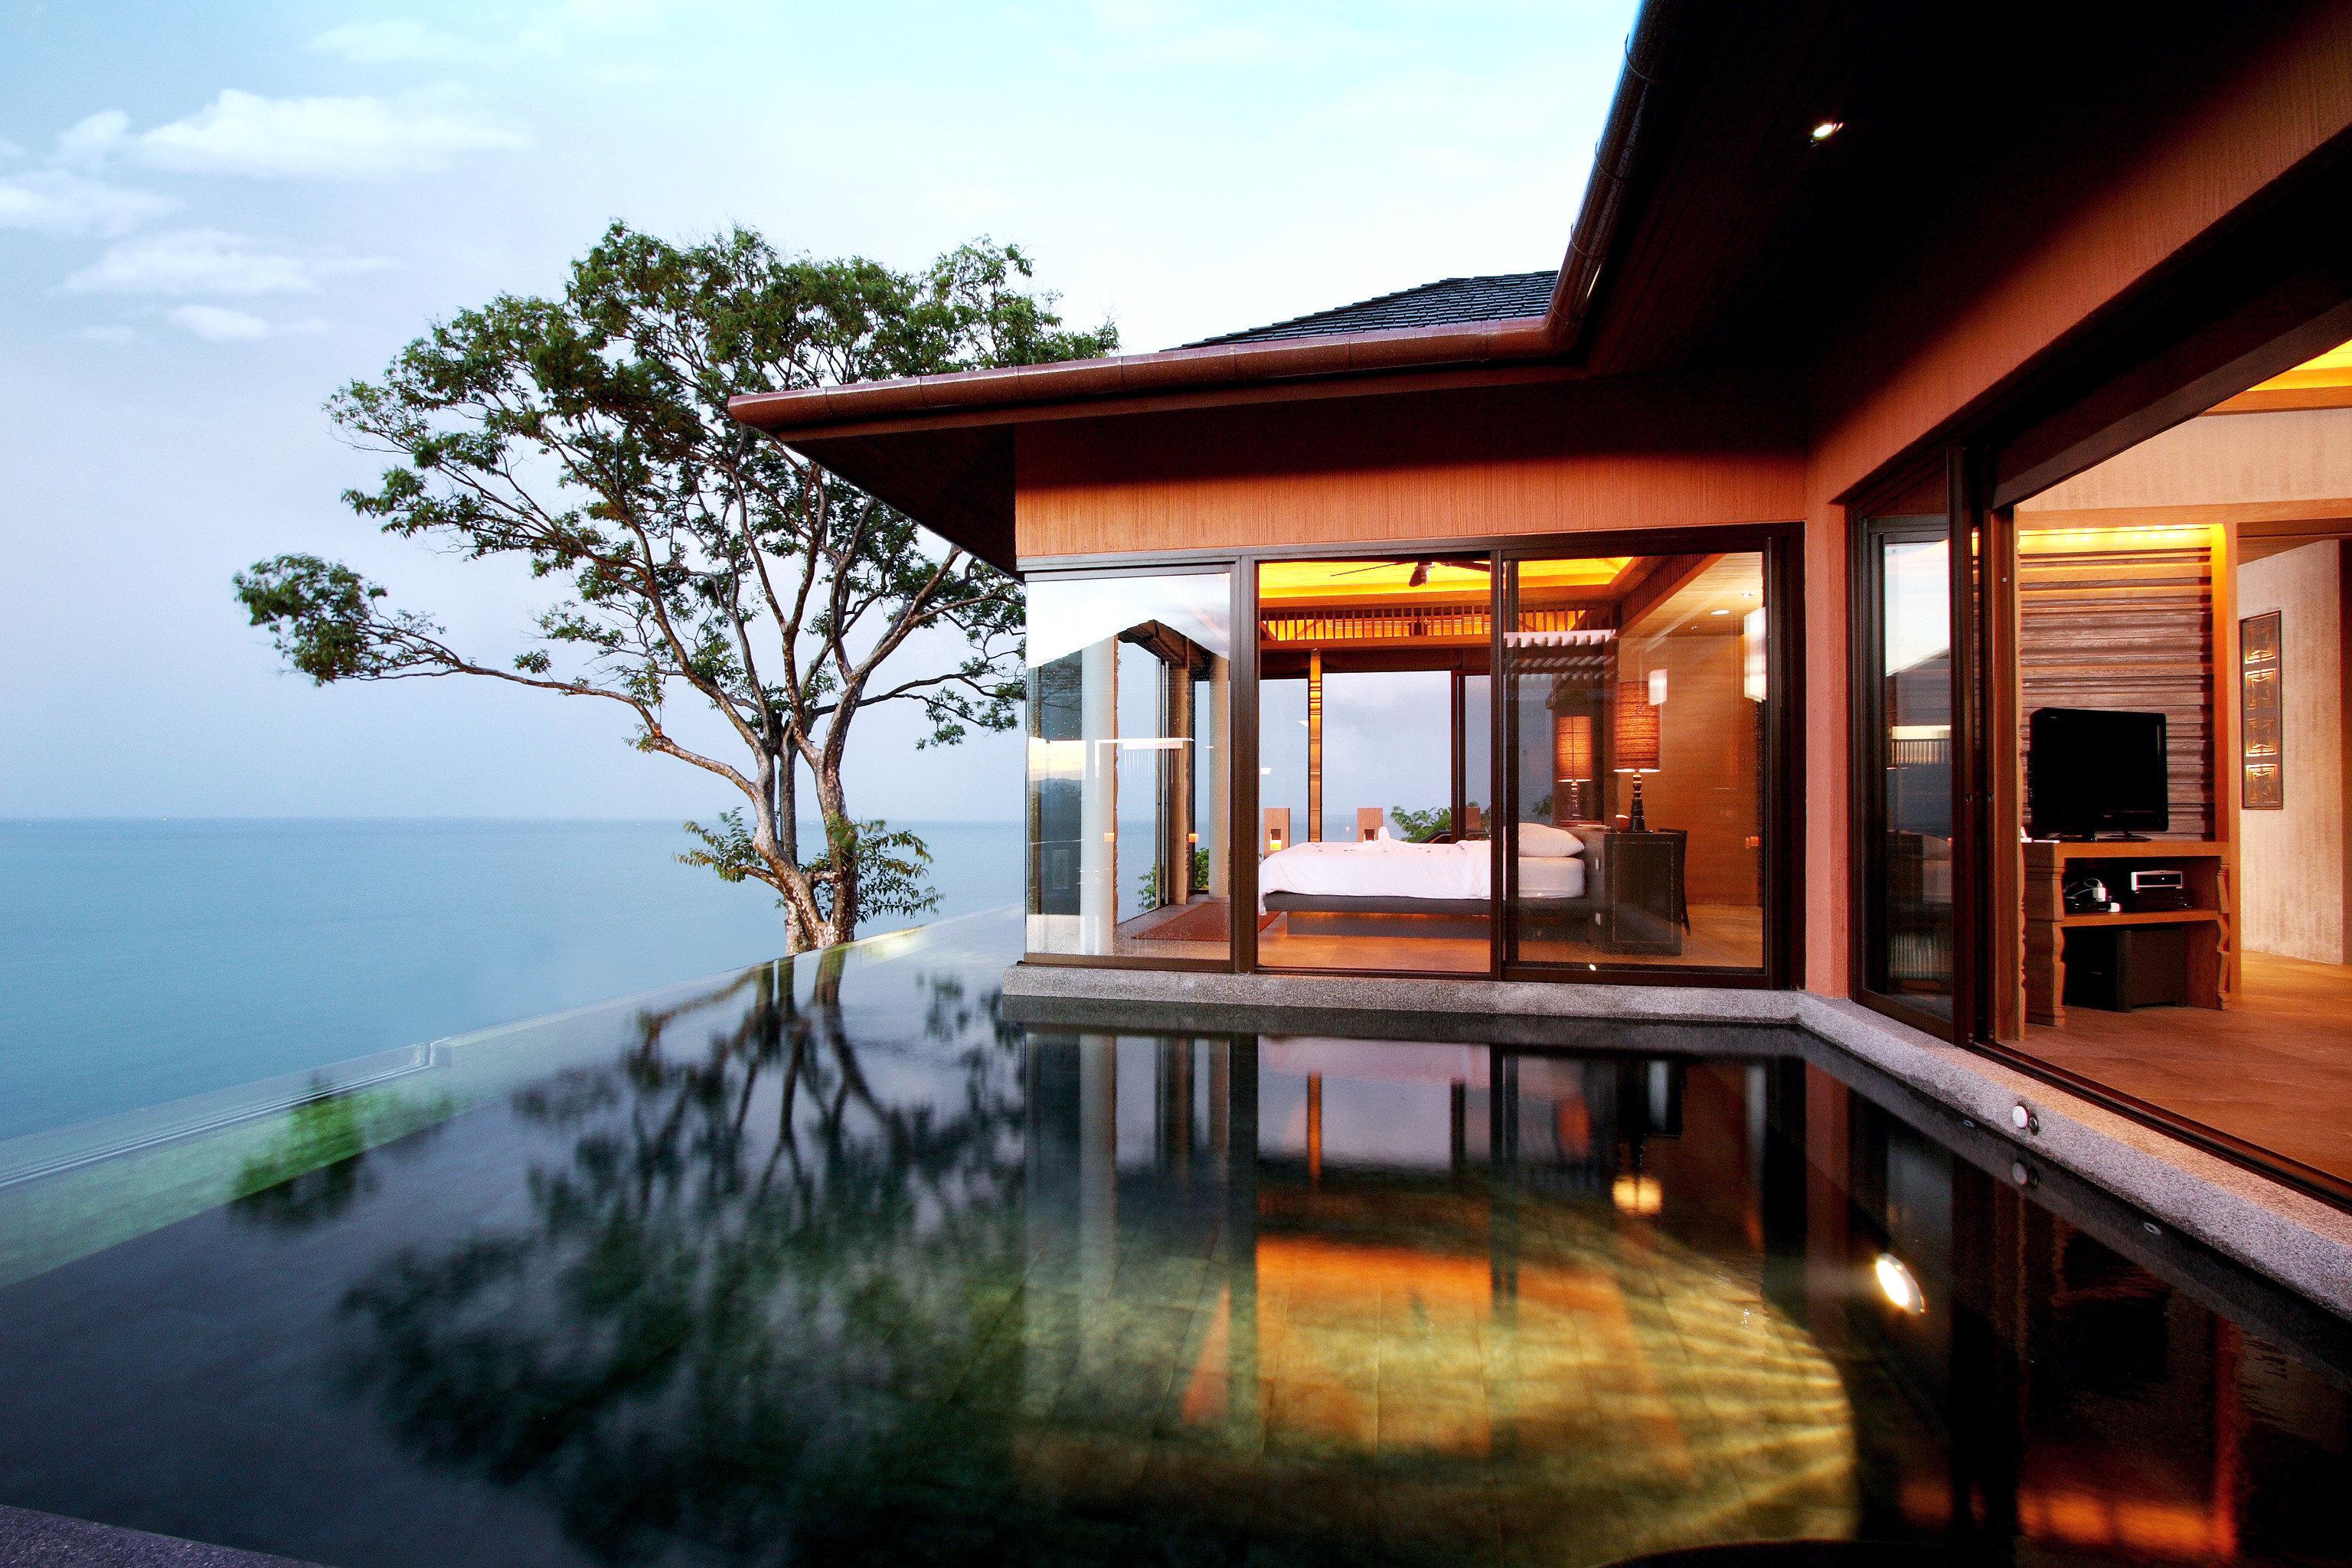 Beach Elegant Exterior Hotels Luxury Modern Patio Phuket Pool Thailand Trip Ideas sky outdoor property house estate home Resort vacation Villa real estate mansion condominium several